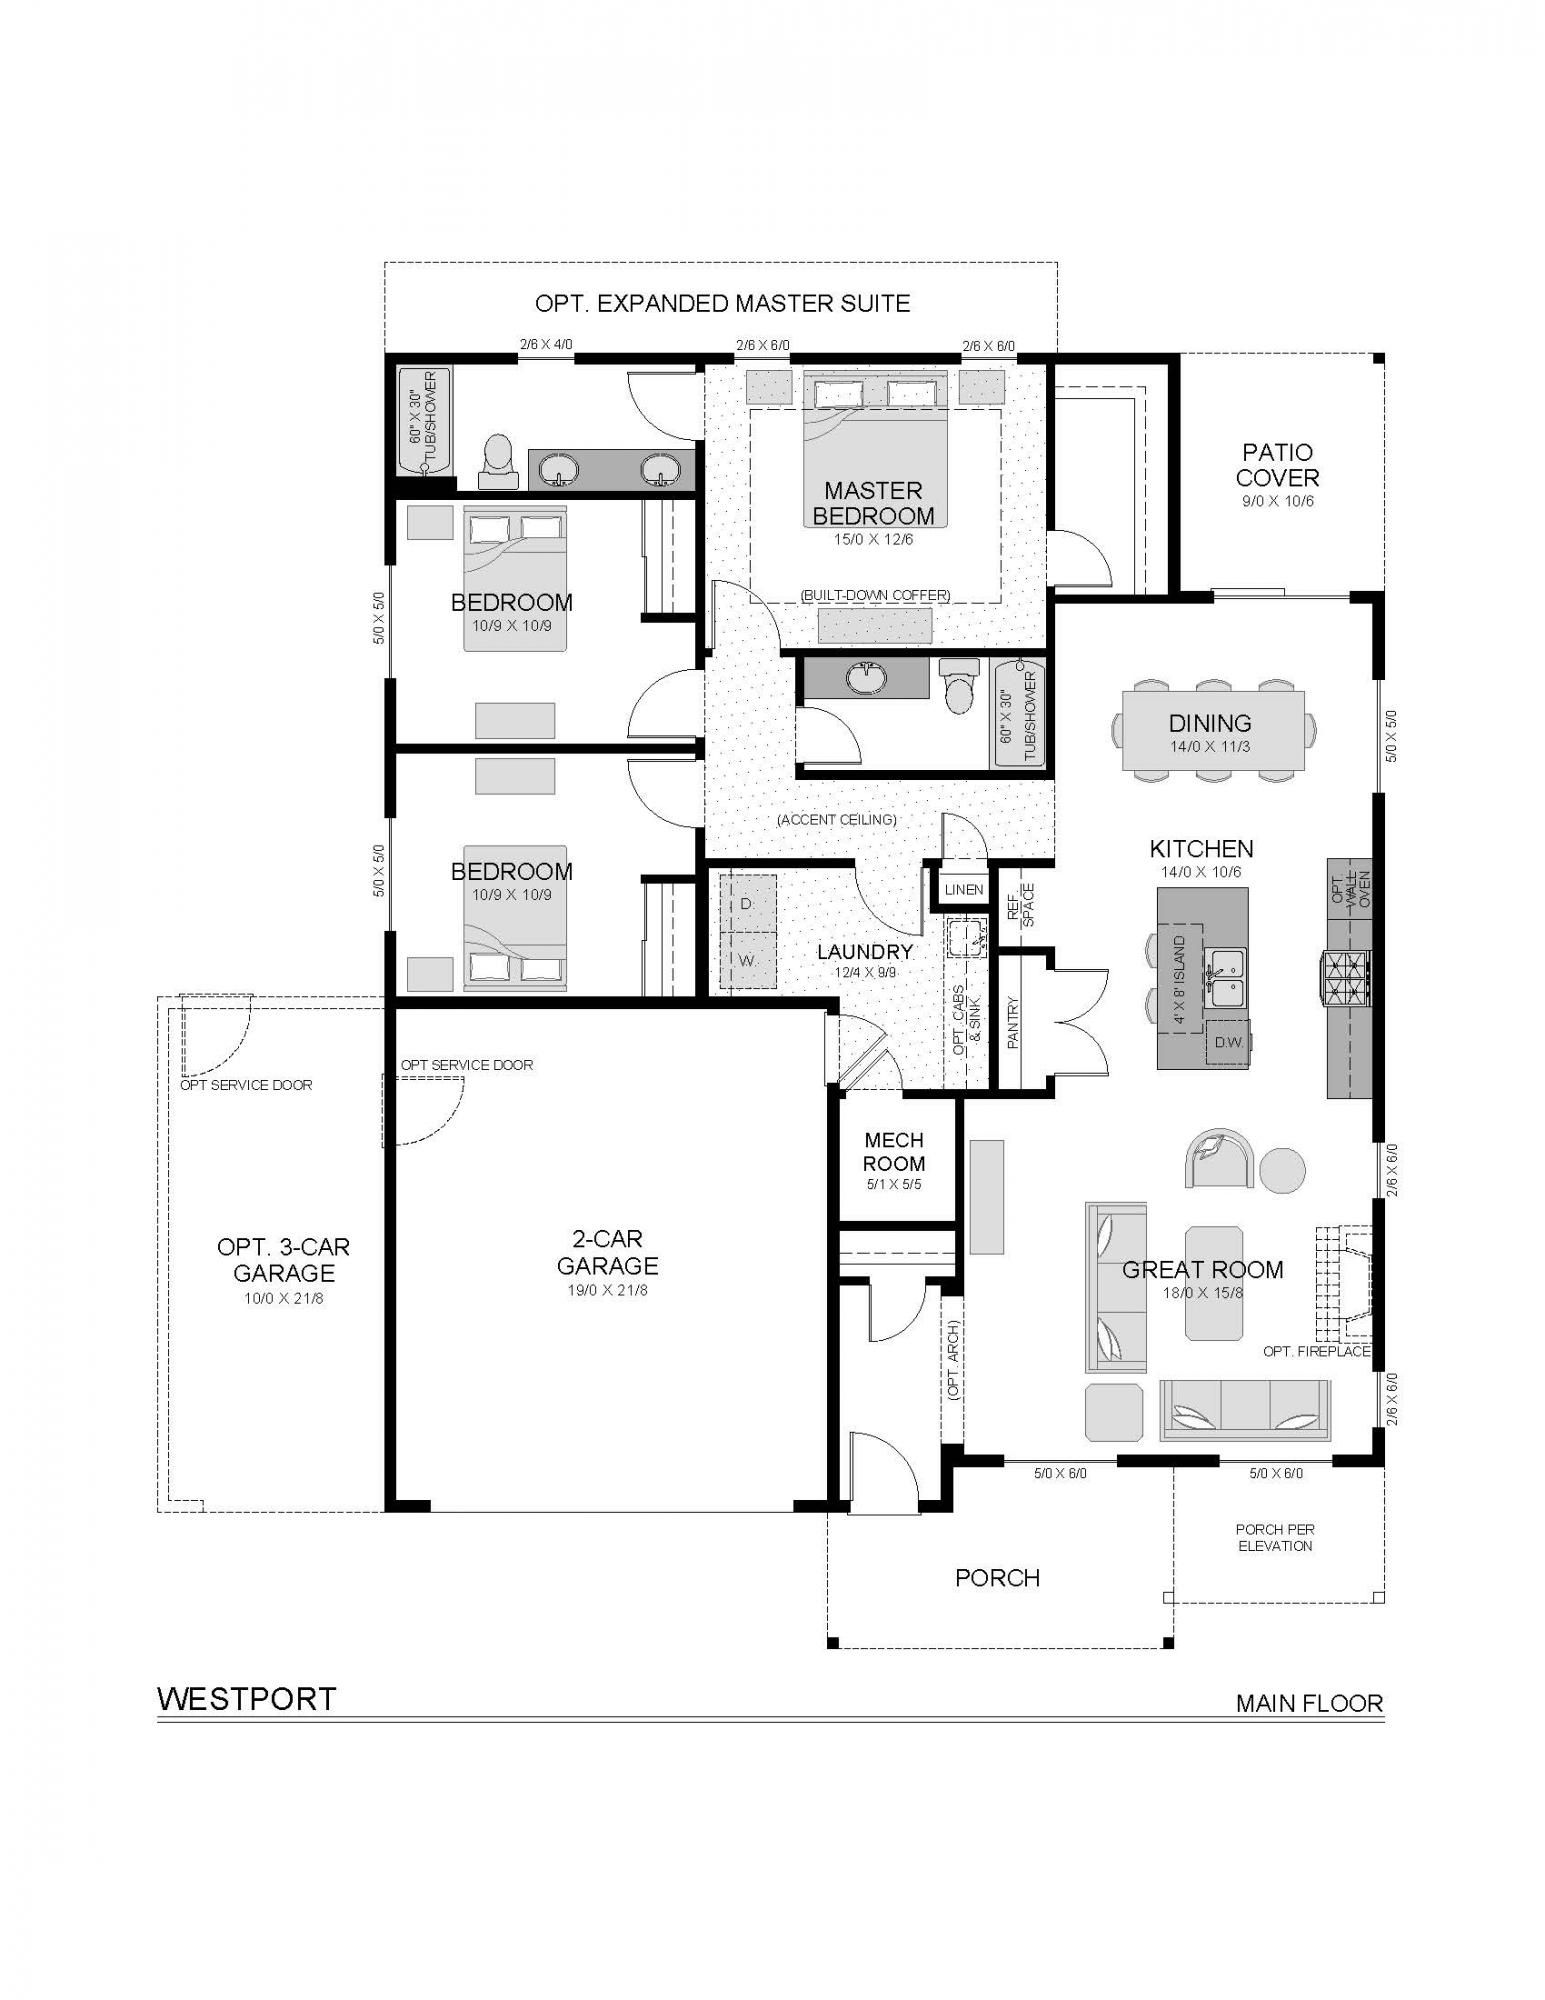 Westport mf small floor plans custom home builders custom homes plan design